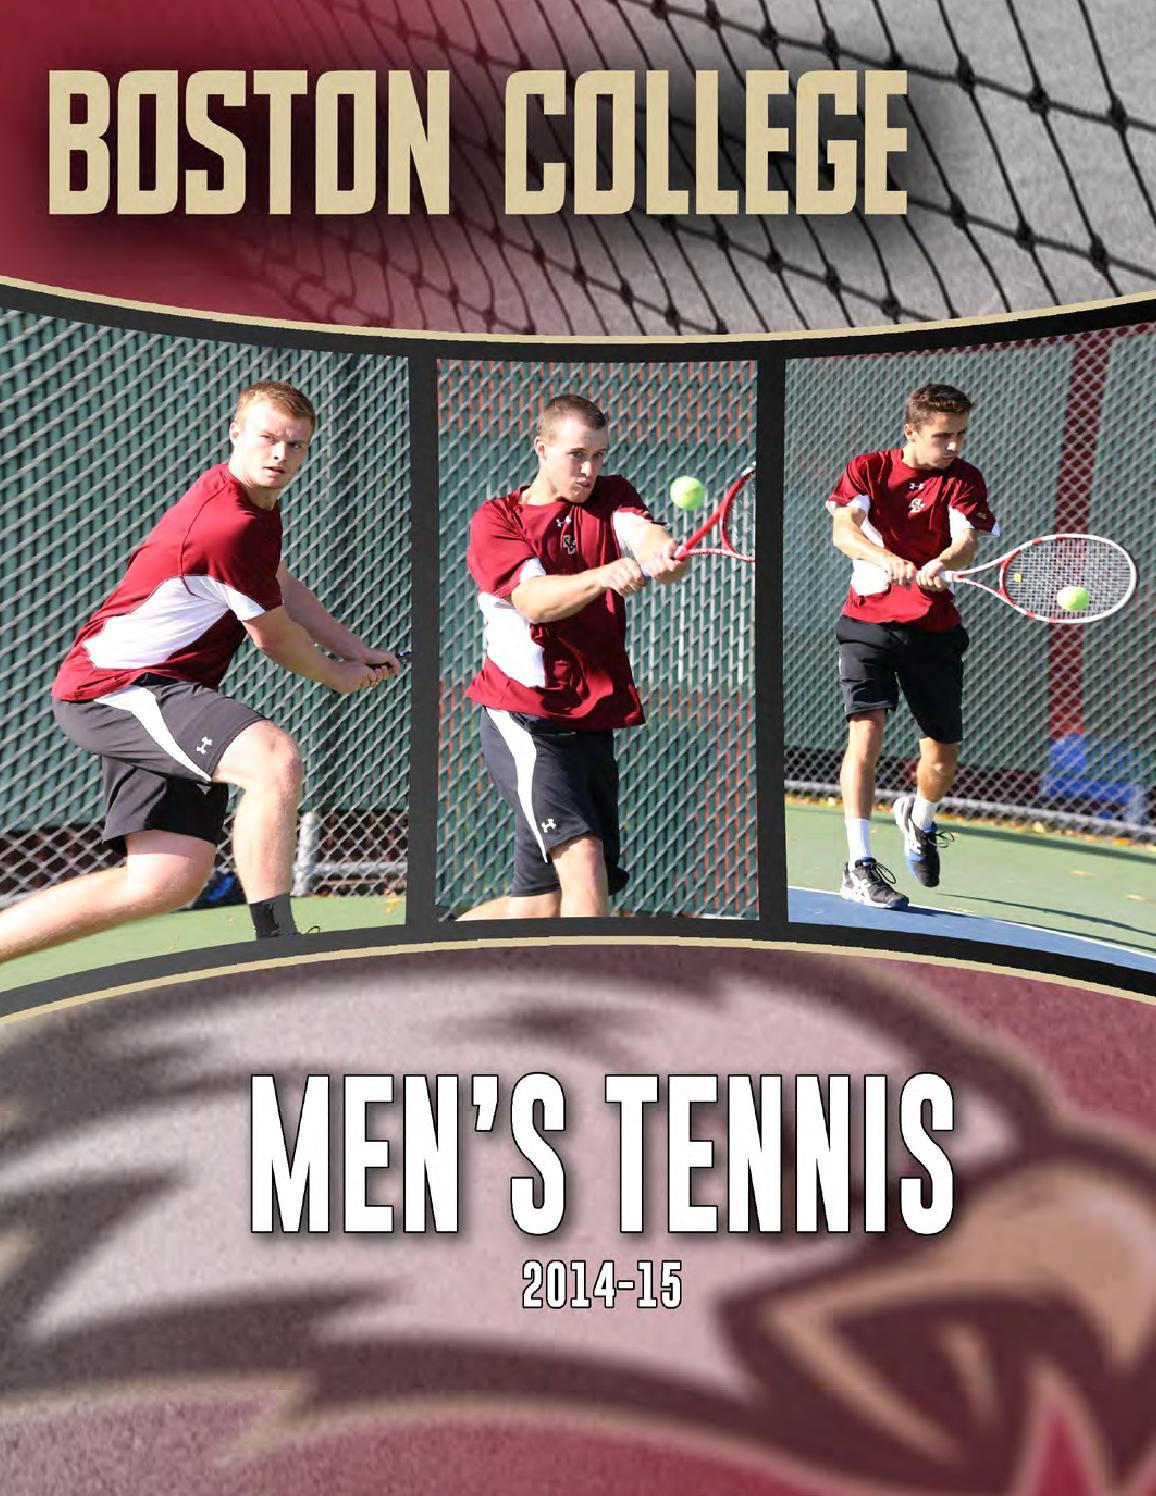 Boston College Men's Tennis Media Guide 2014-15 by ...